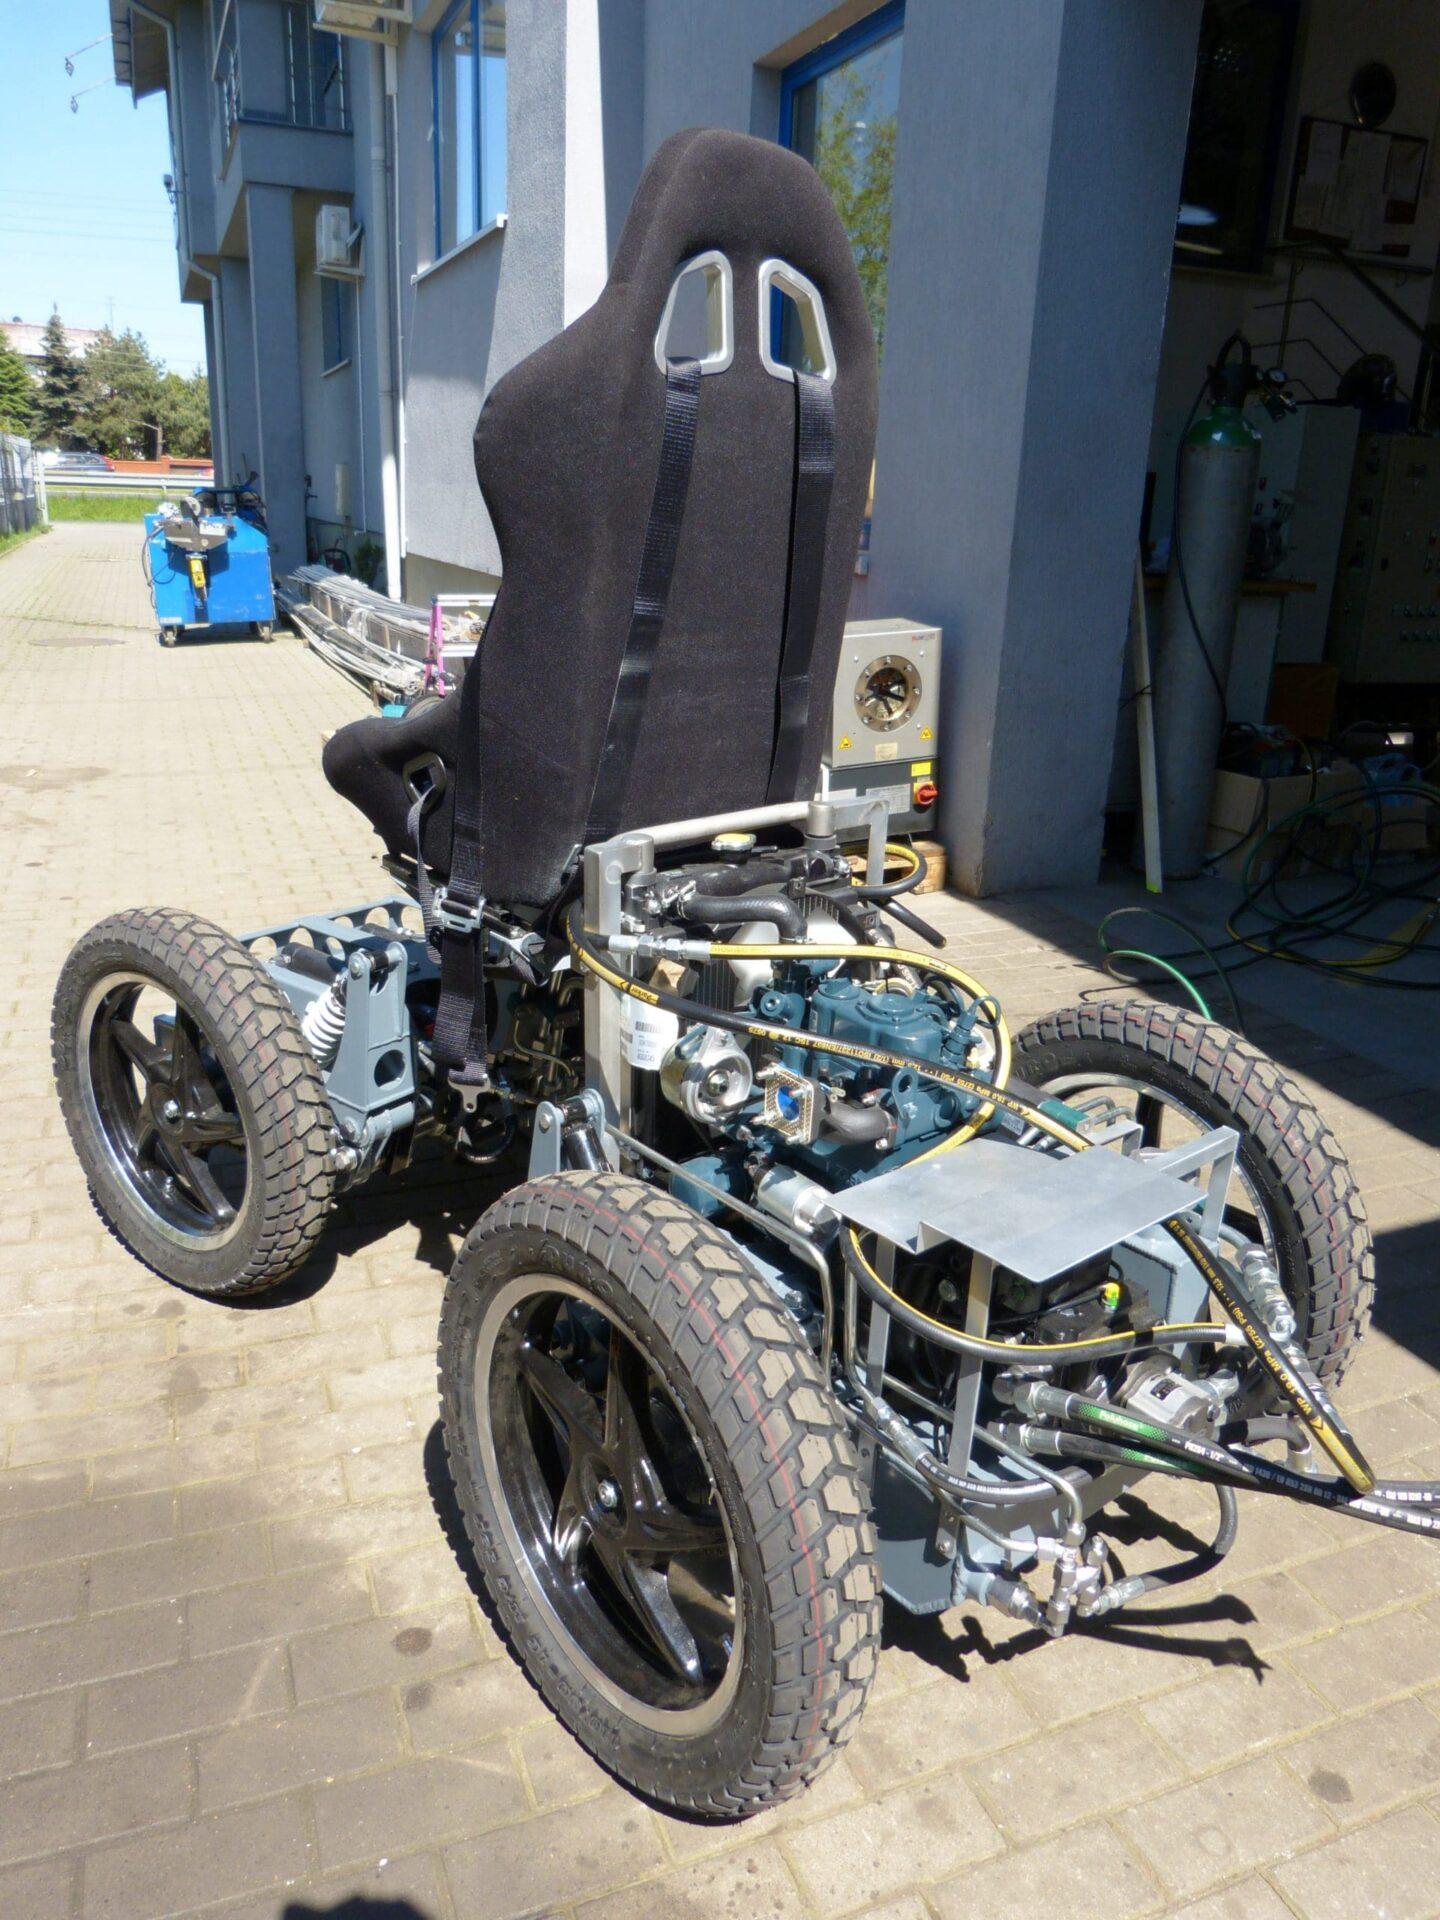 samobiezny pojazd z napedem hydrostatycznym e1515484078388 scaled - Workstations for the laboratory of unmanned platform drives